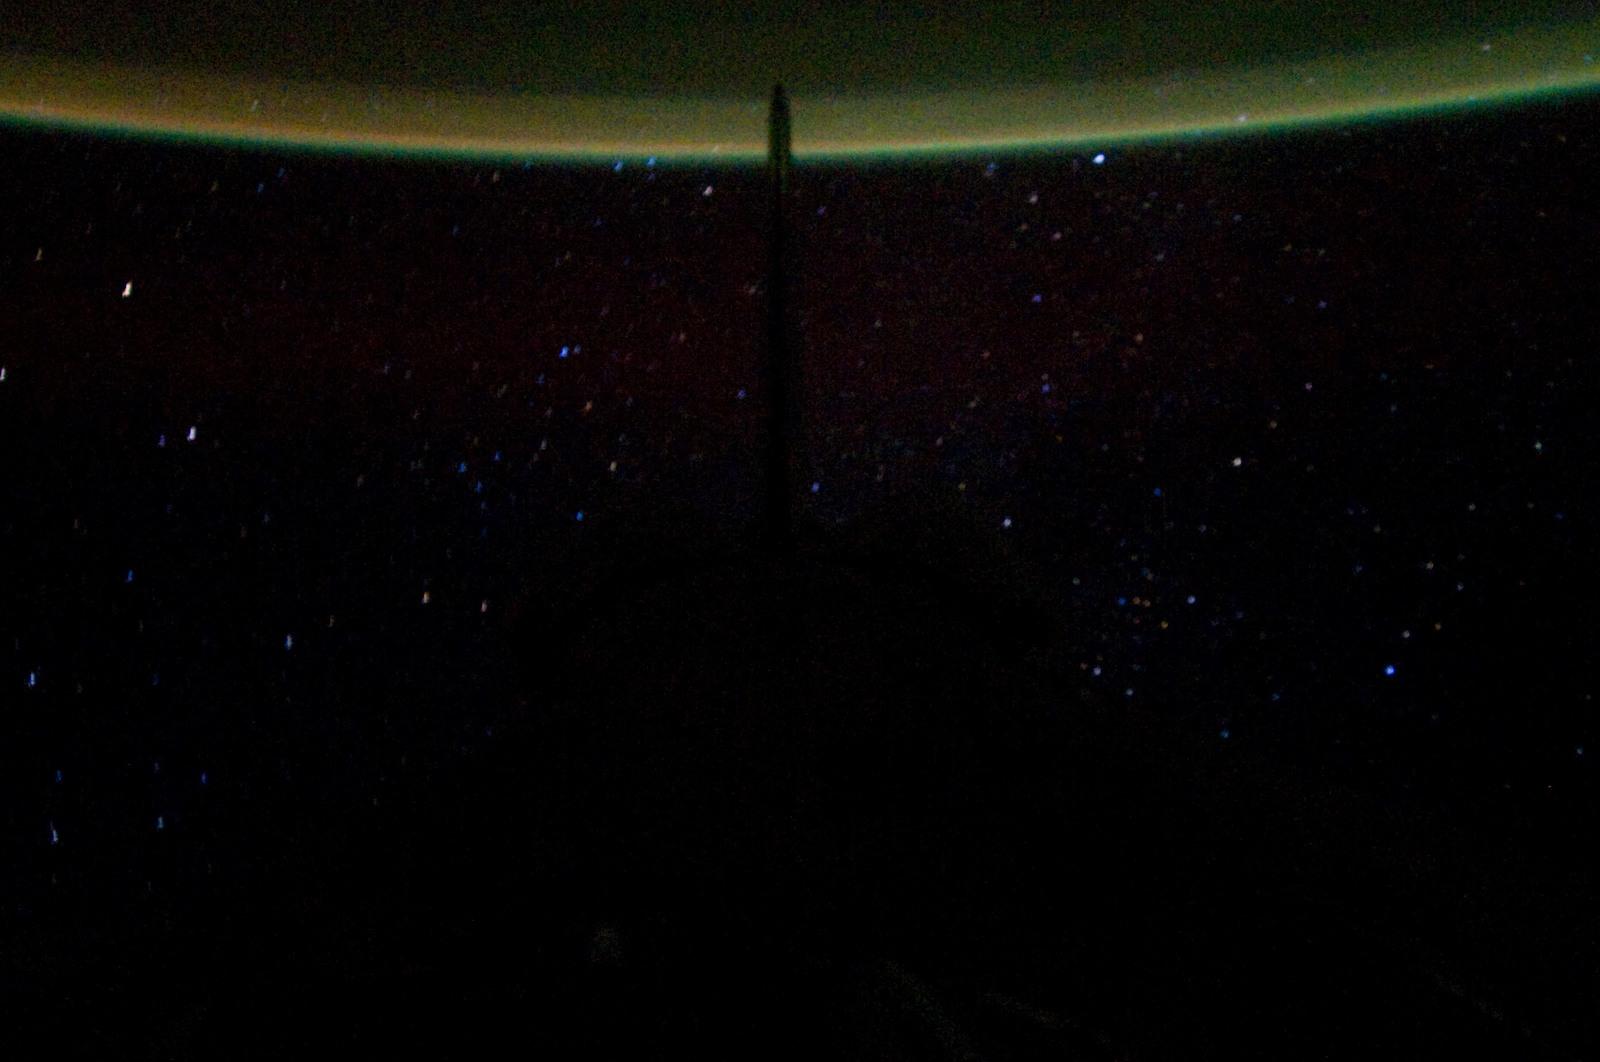 S134E012330 - STS-134 - Earth Observation taken from Aft Flight Deck Window